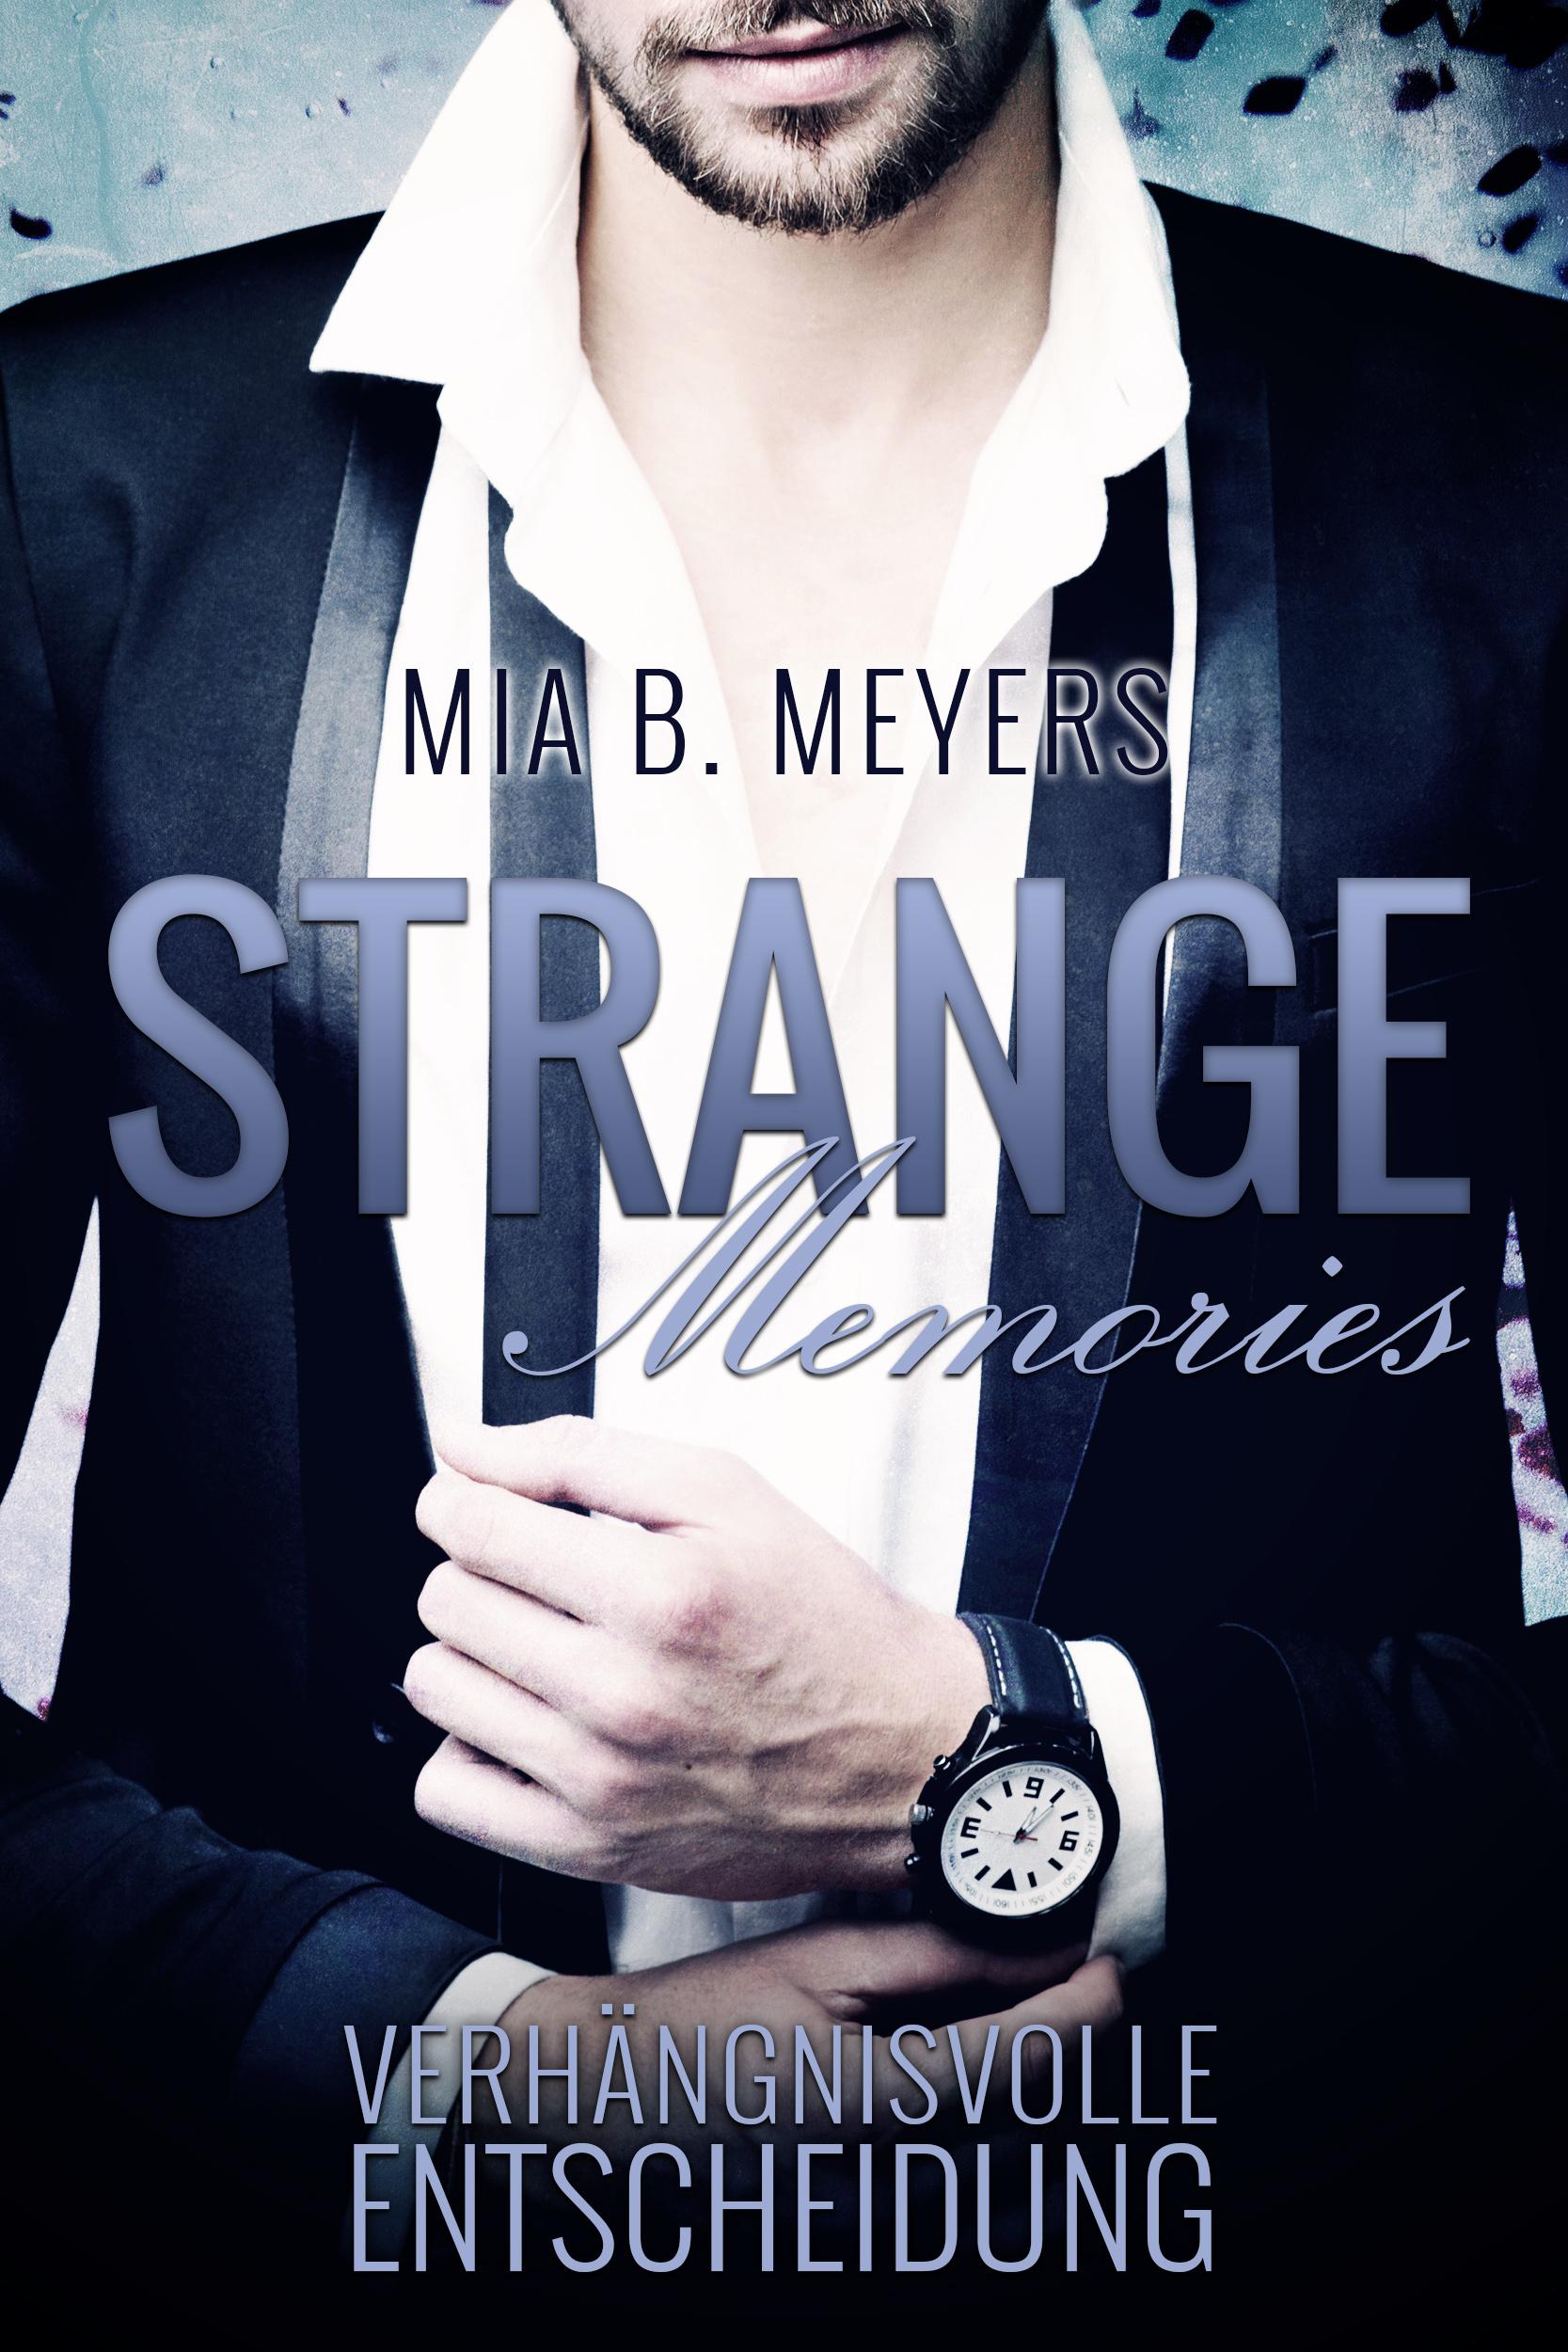 Mia B. Meyers – Strange Memories